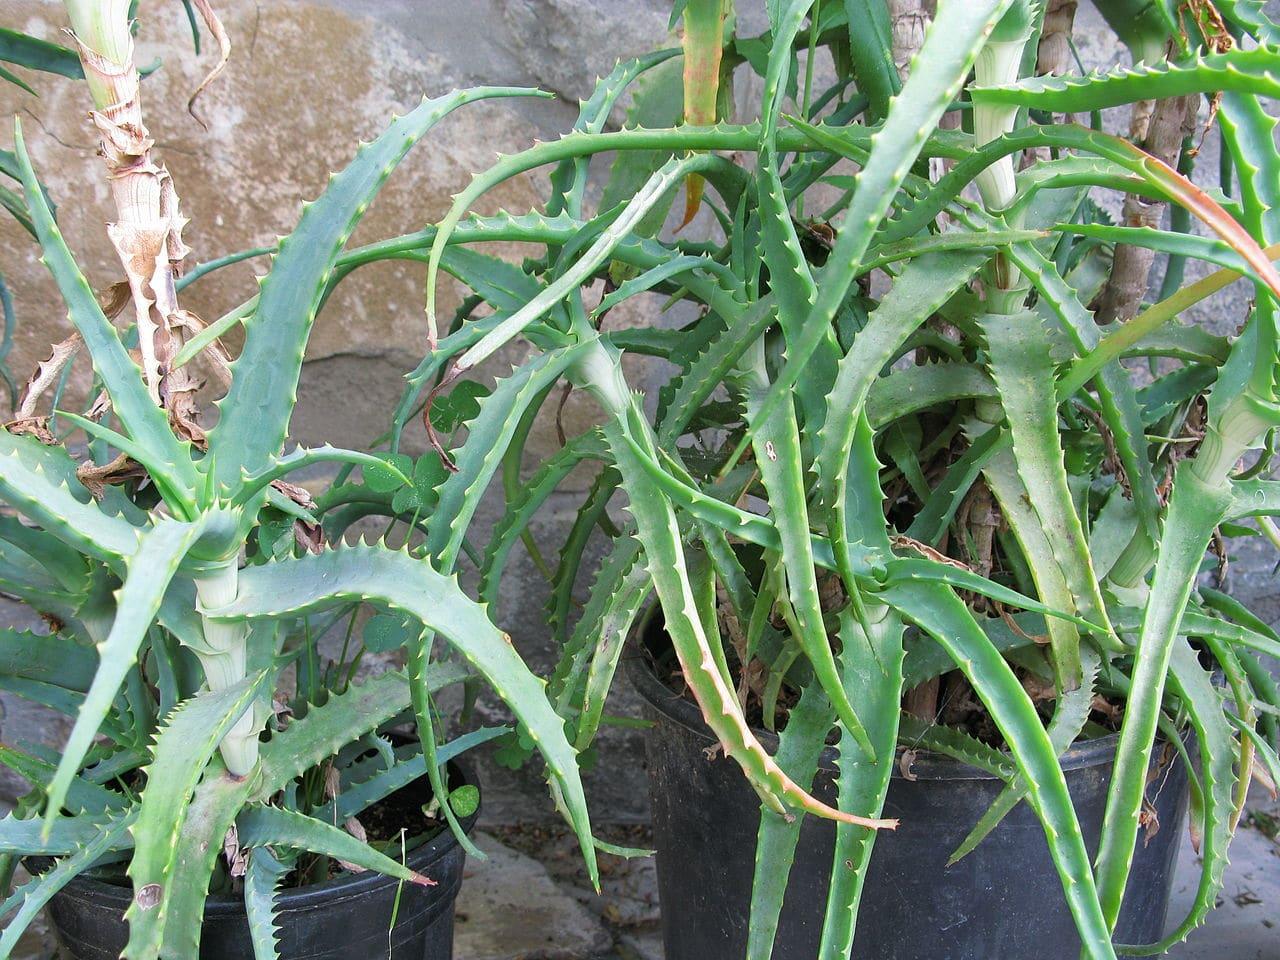 Vista del Aloe arborescens